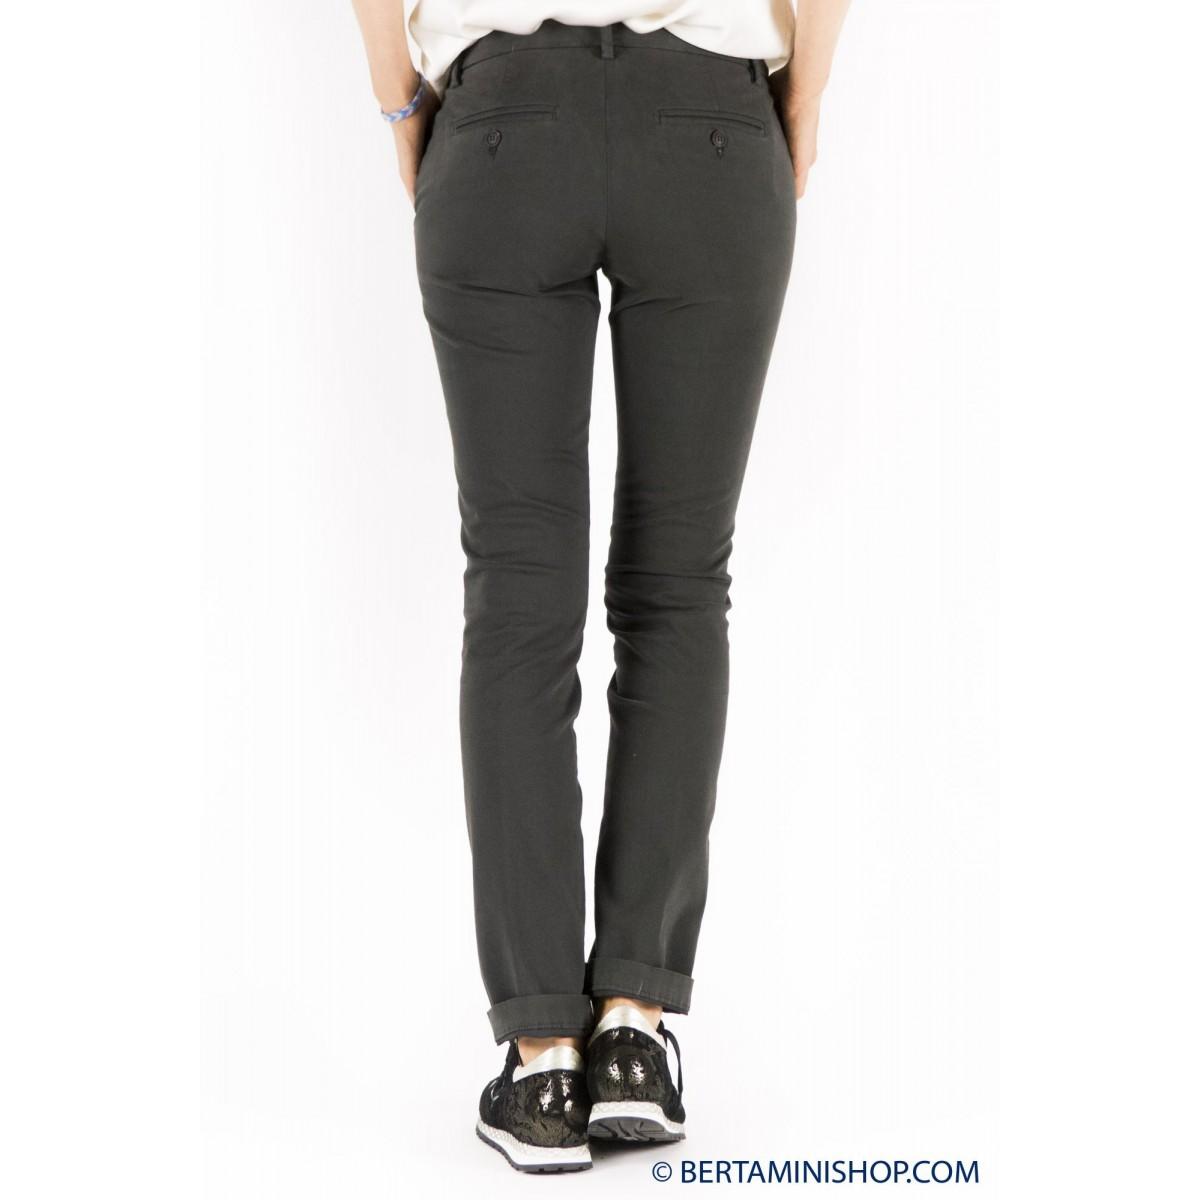 Trousers Roy Rogers Woman - Roxane Raso 248 - Asfalto